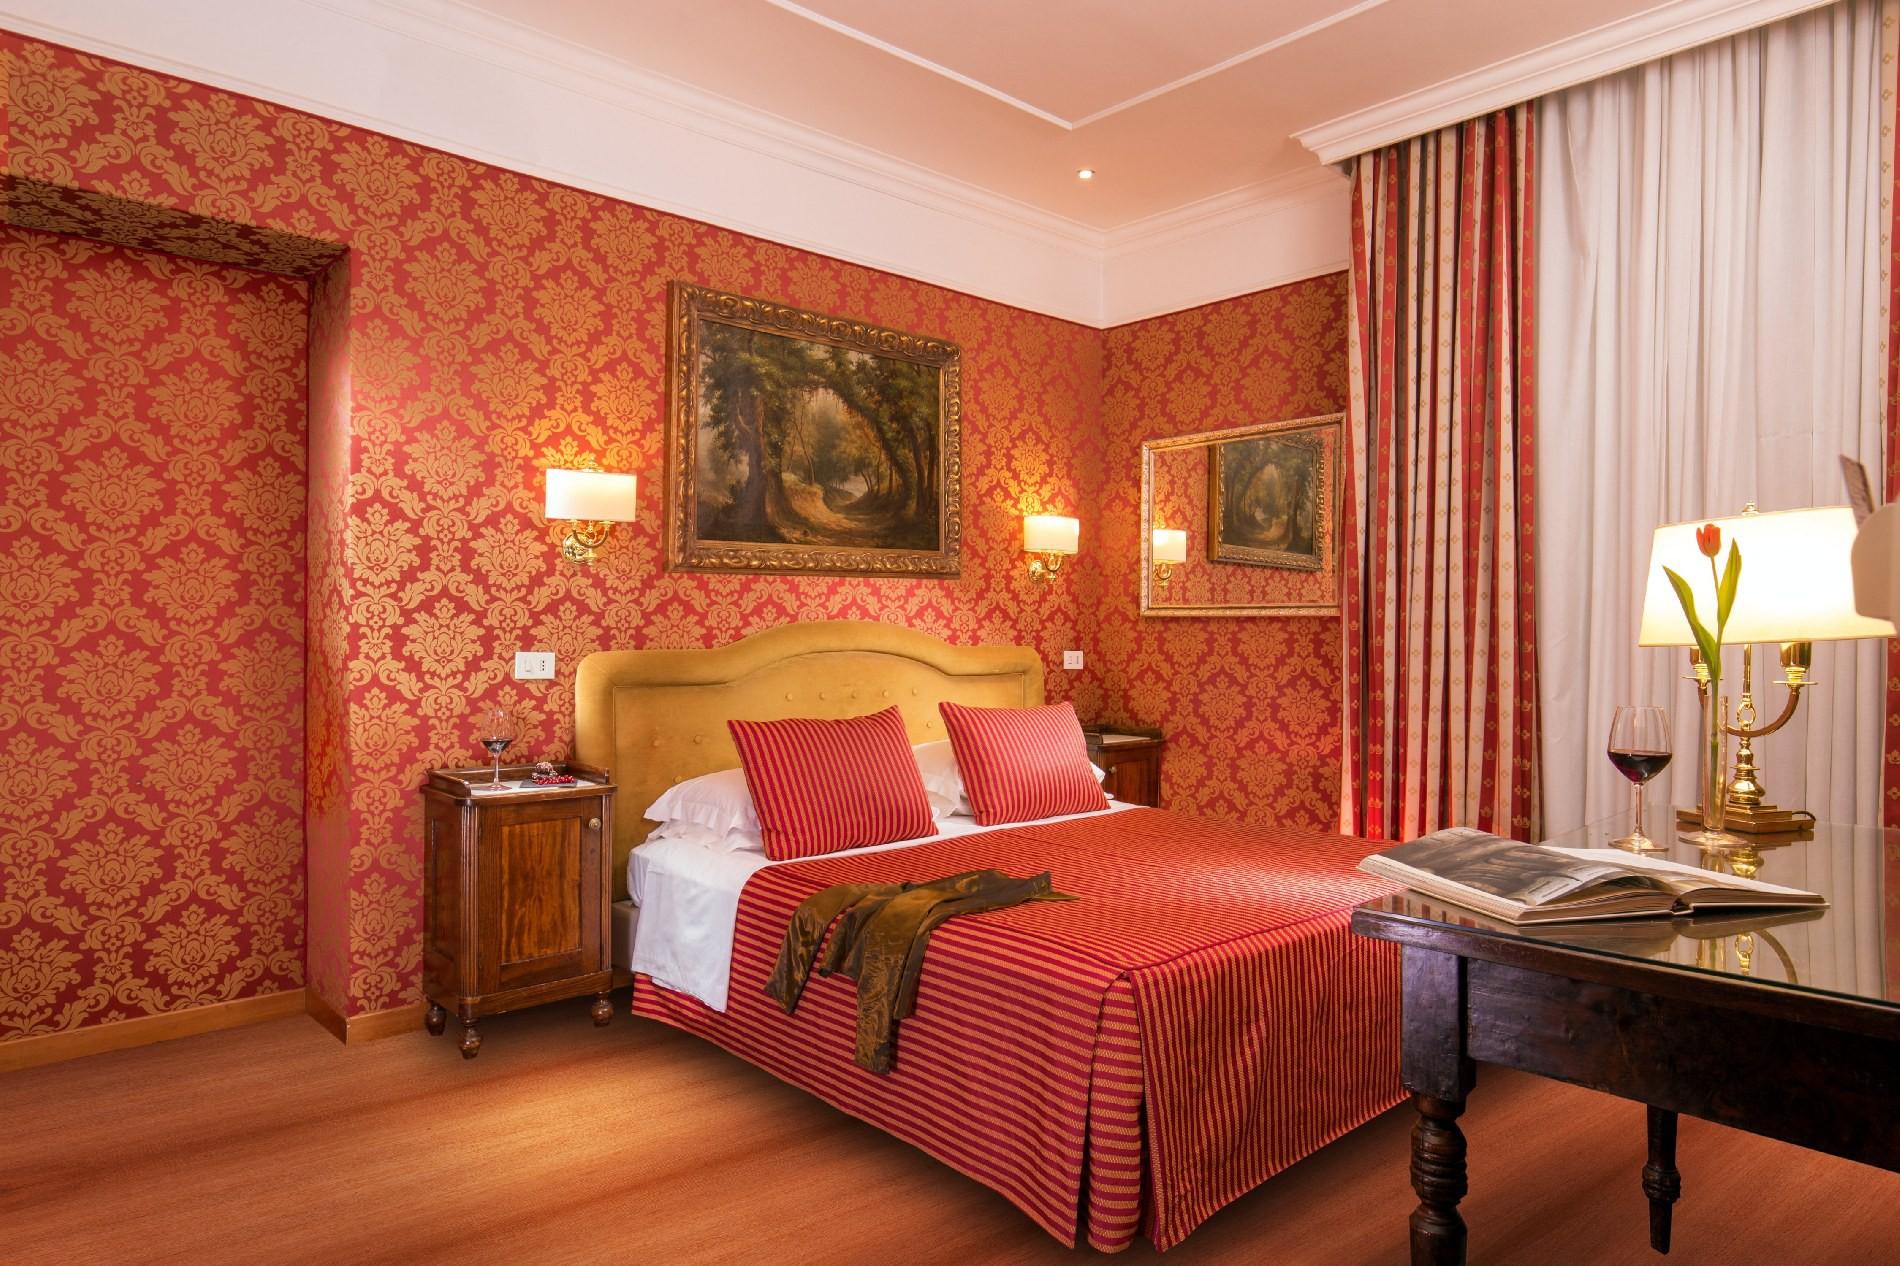 Hotel morgana roma camera comfort hotel 4 stelle roma for Camera roma